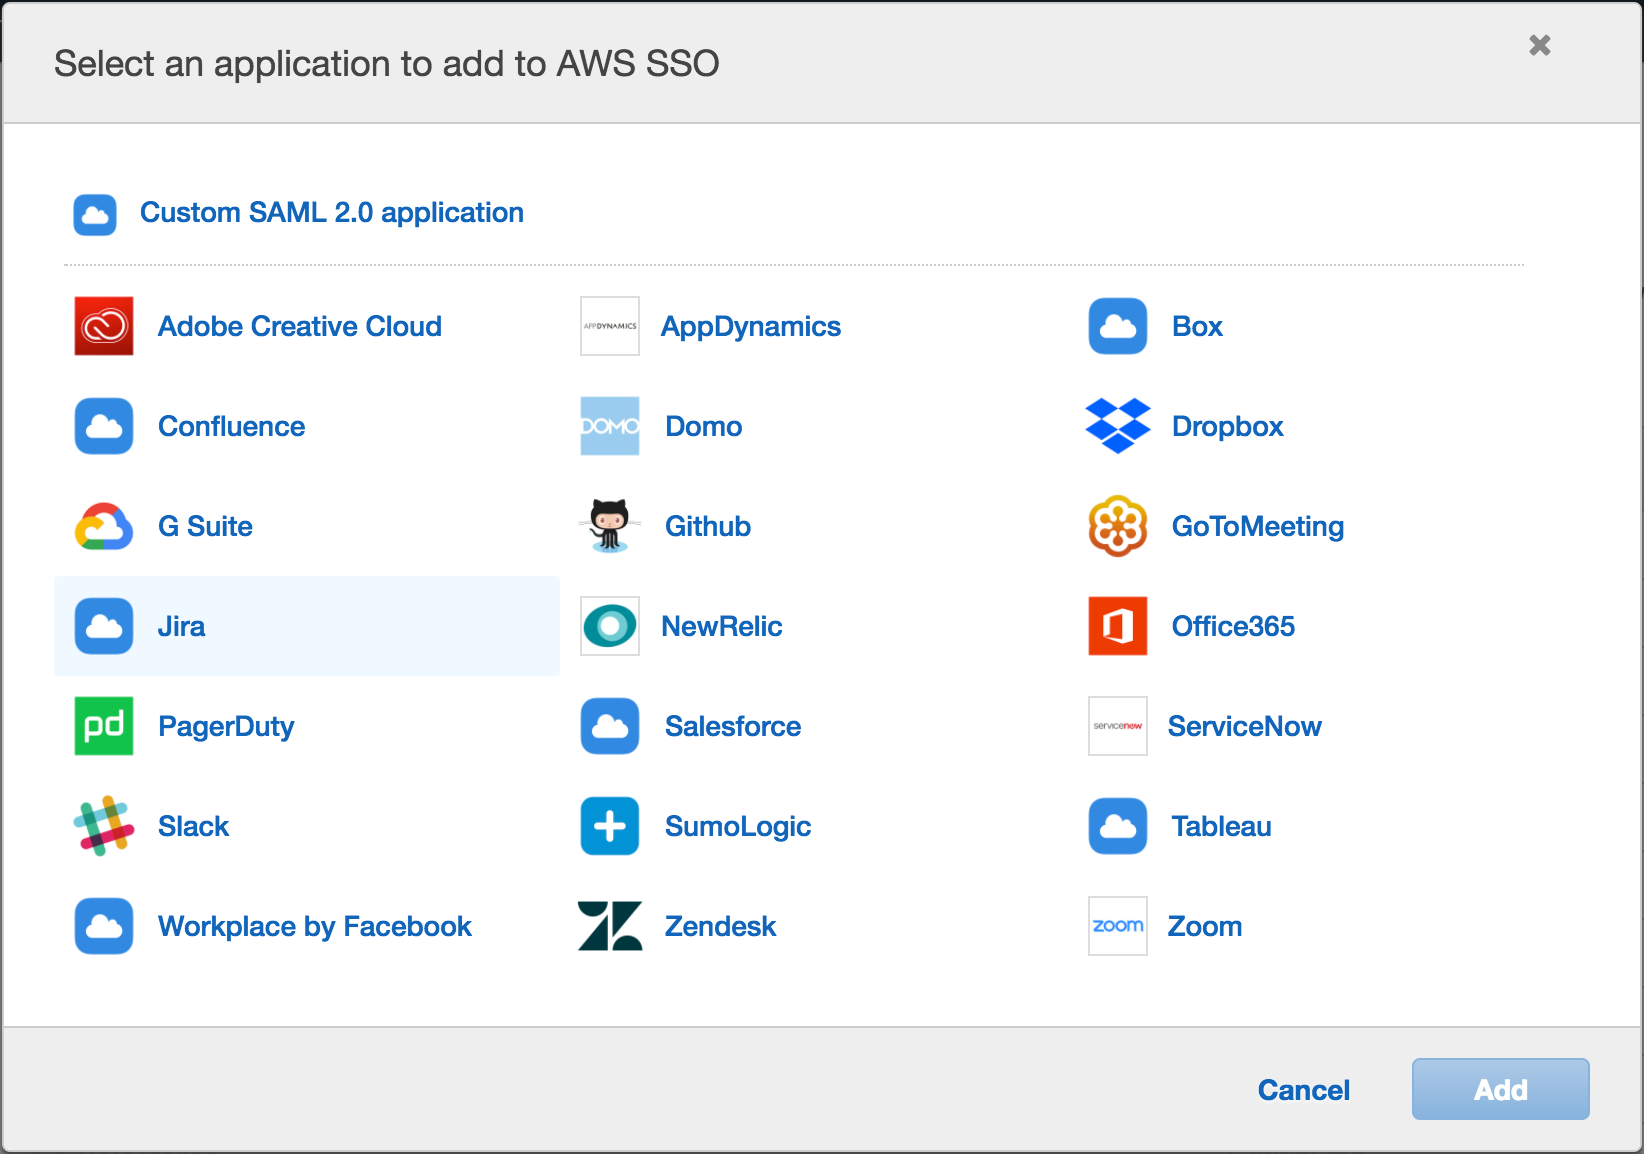 AWS SSO applications